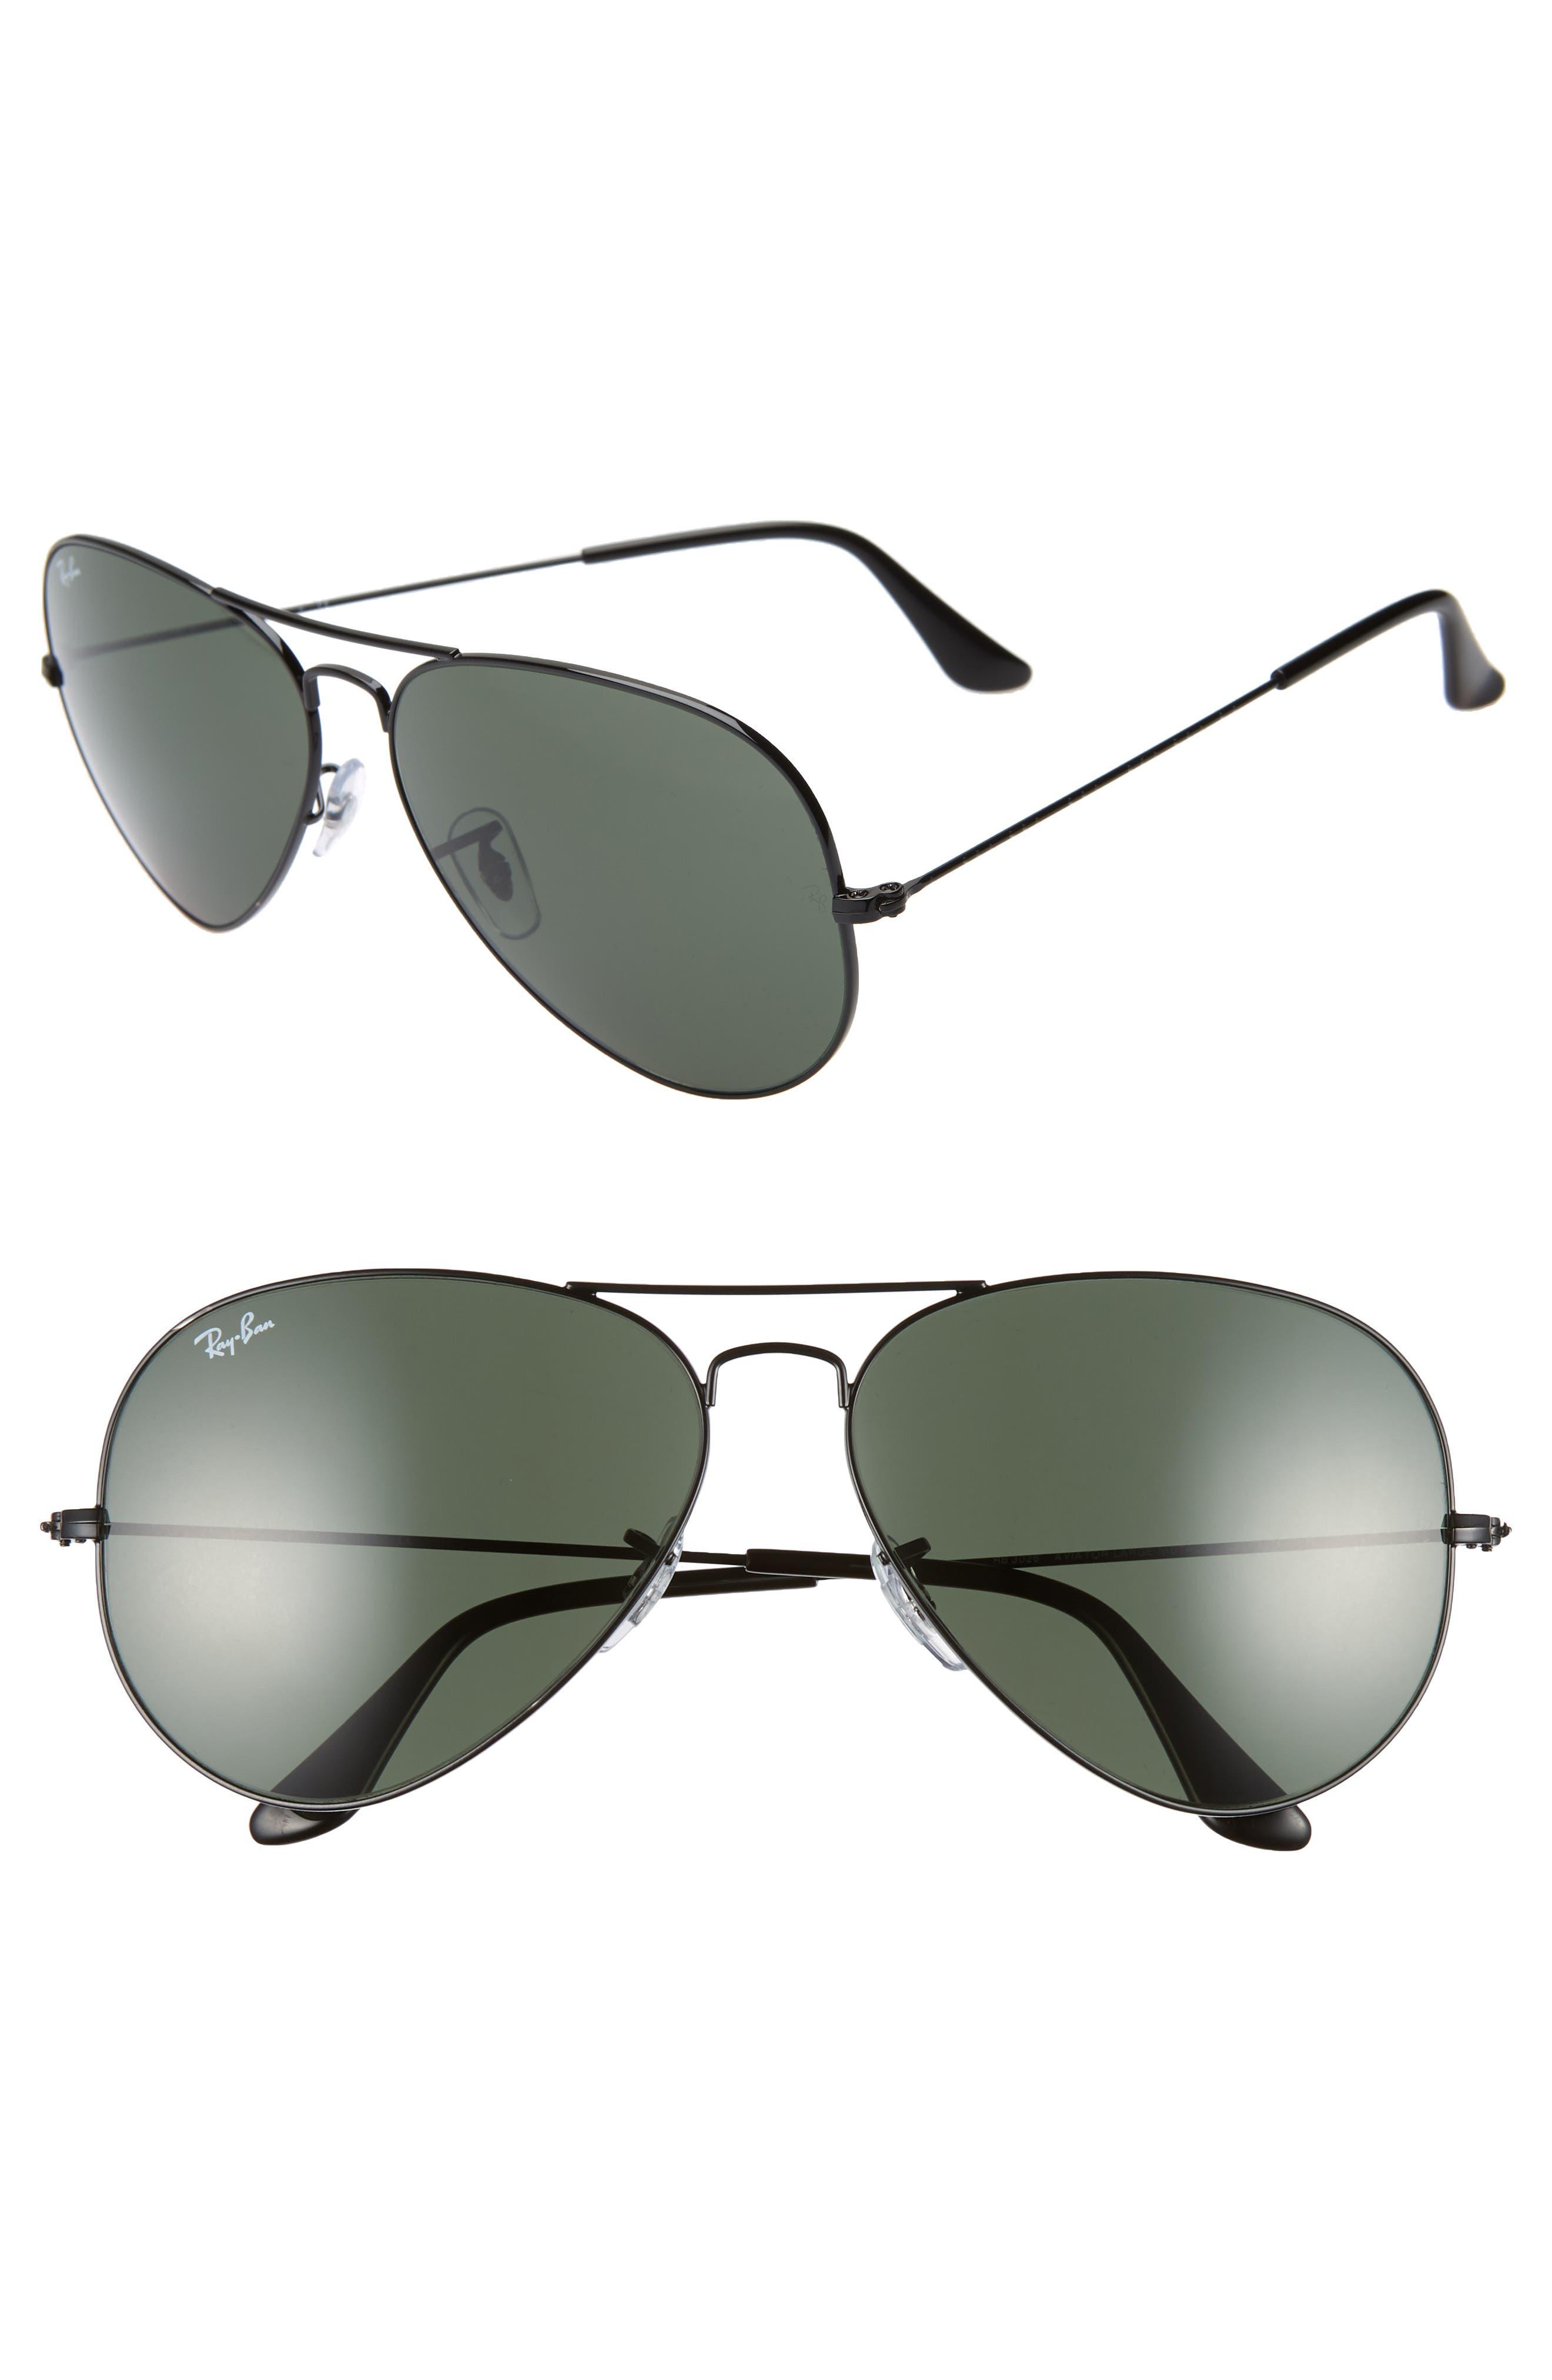 Ray-Ban 62Mm Aviator Sunglasses - Black/ Green Solid